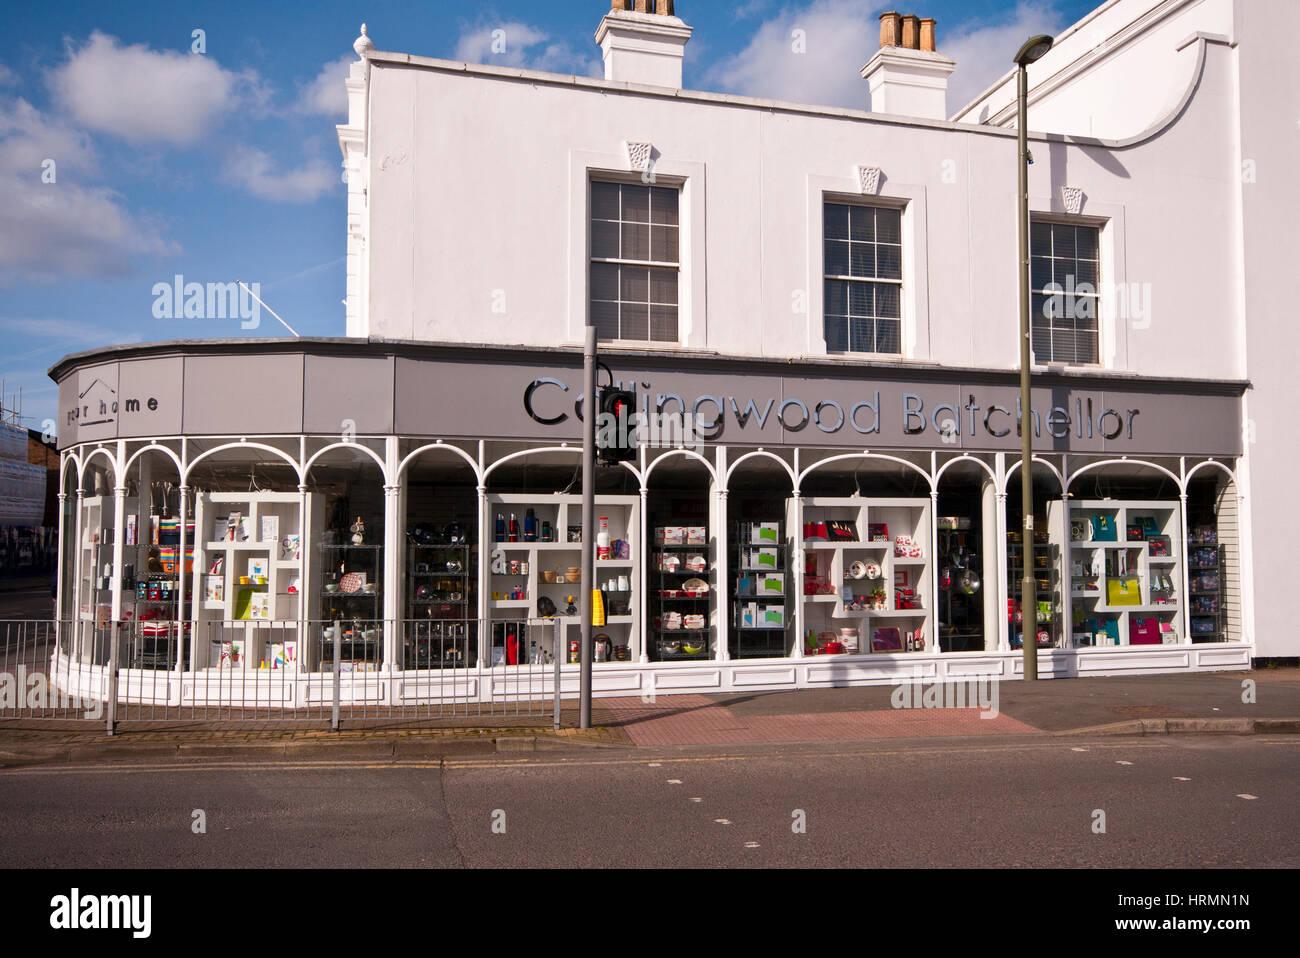 Exterior Outside Of Collingwood Batchellor Department Store Horley Surrey England UK Stock Photo